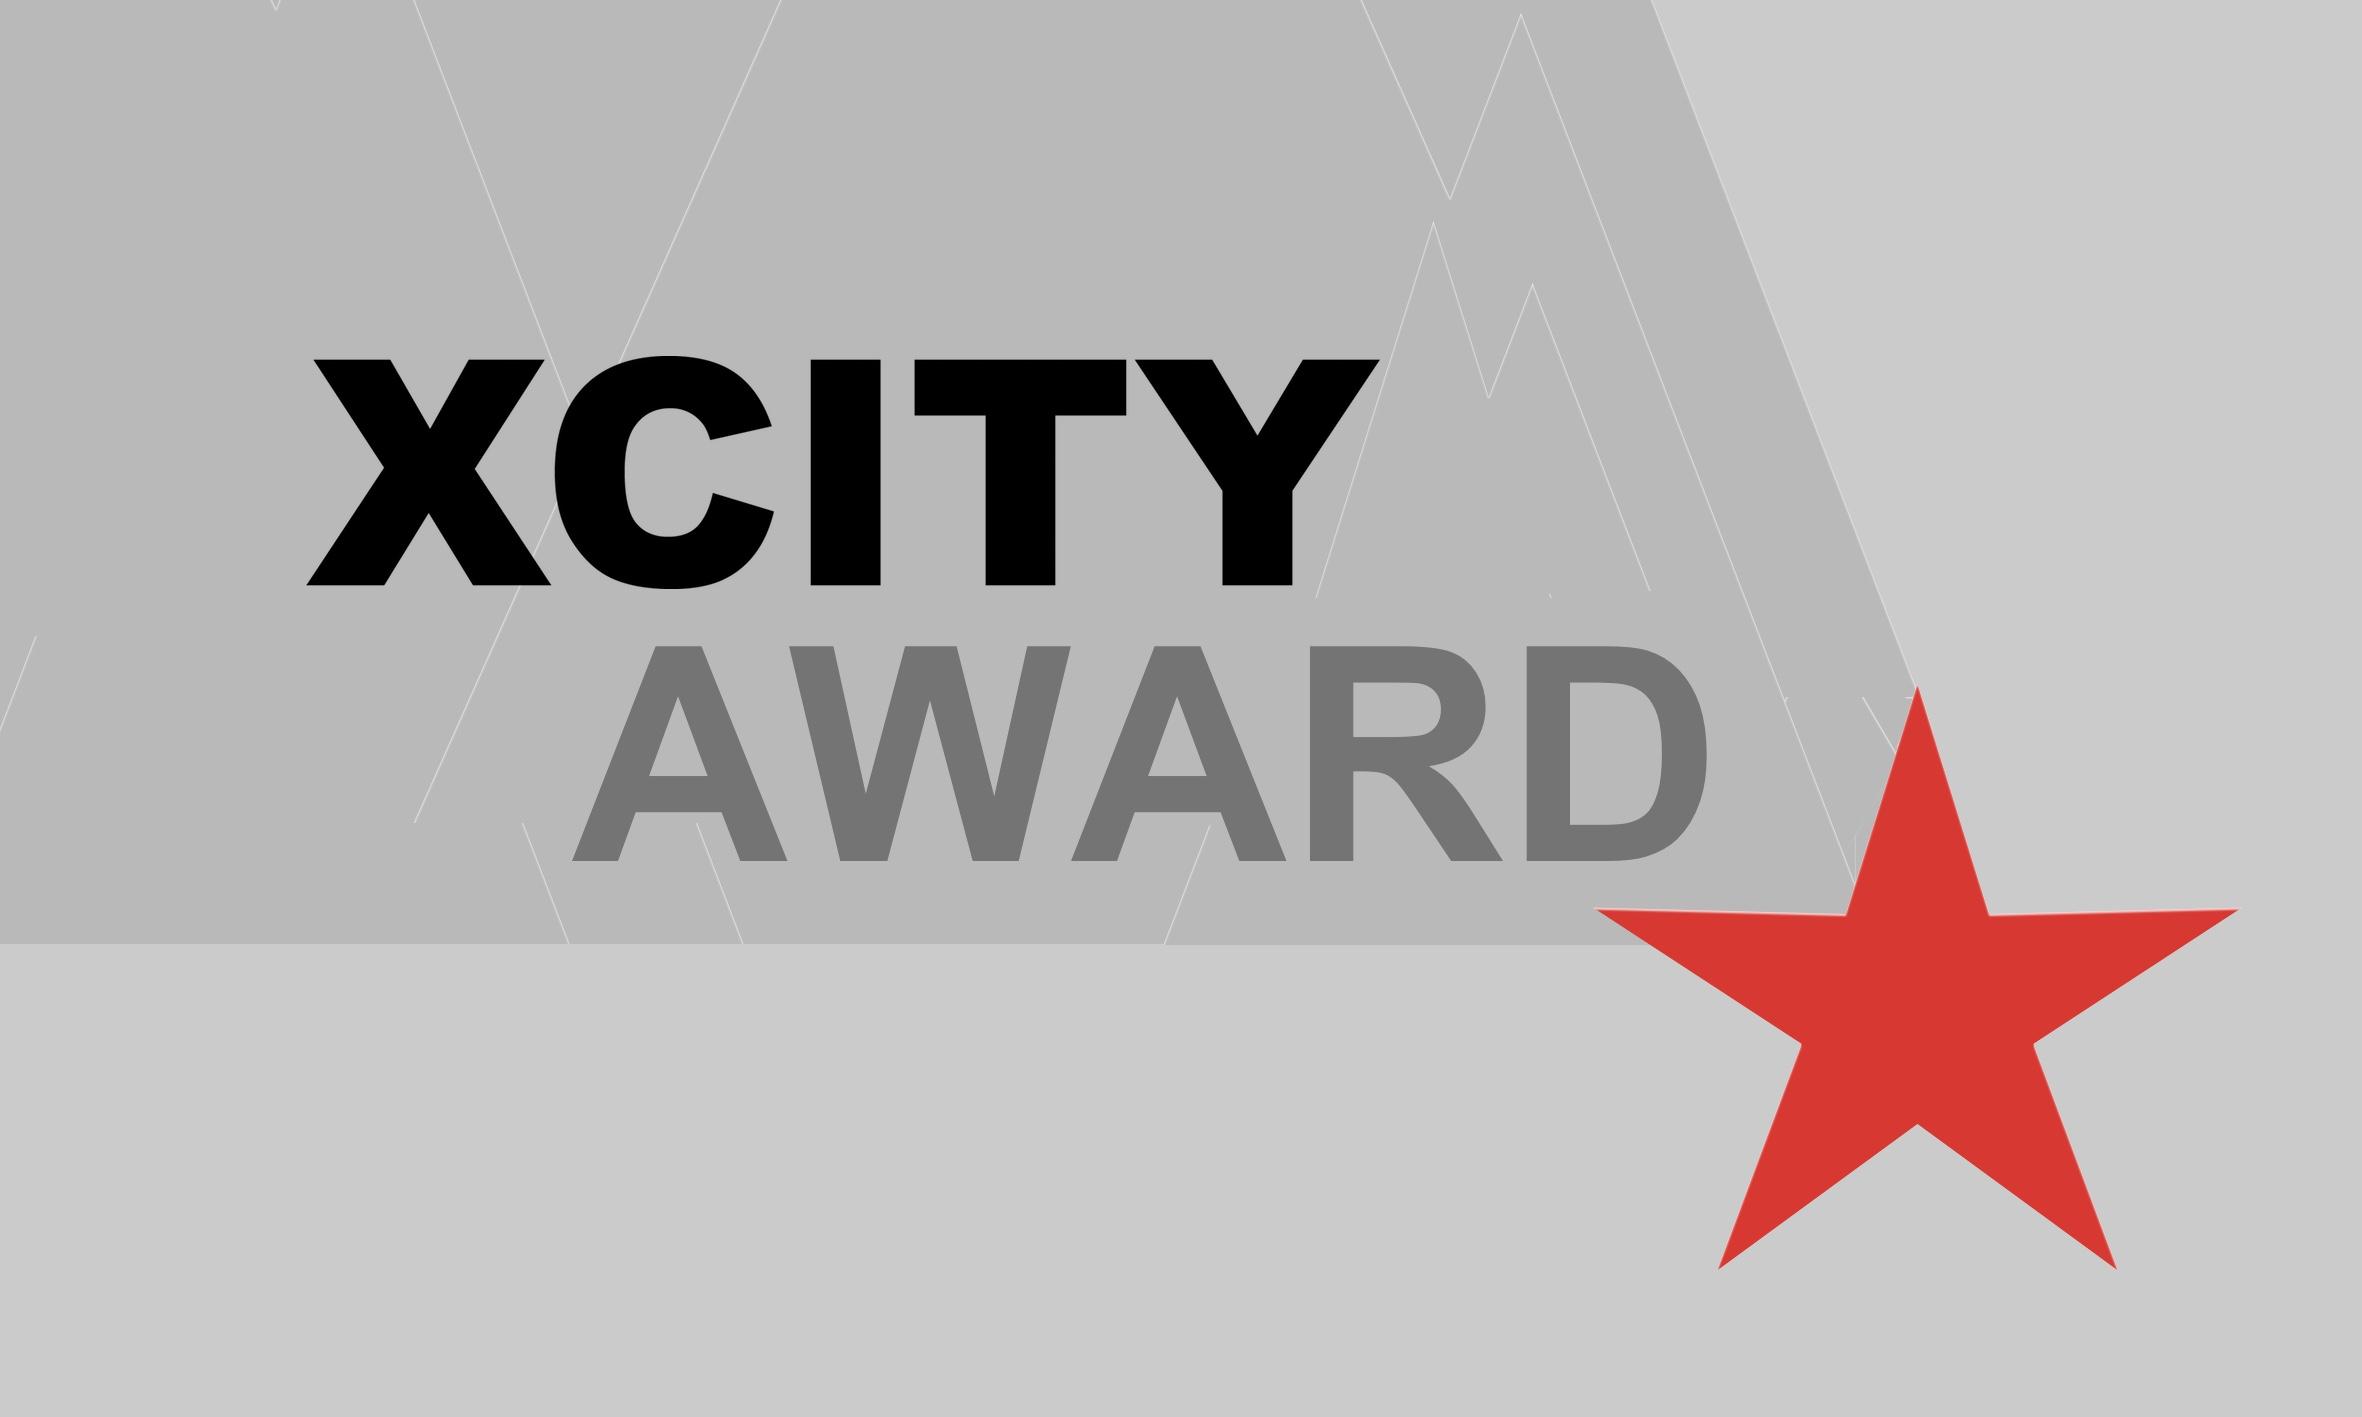 xCity Award feature photo